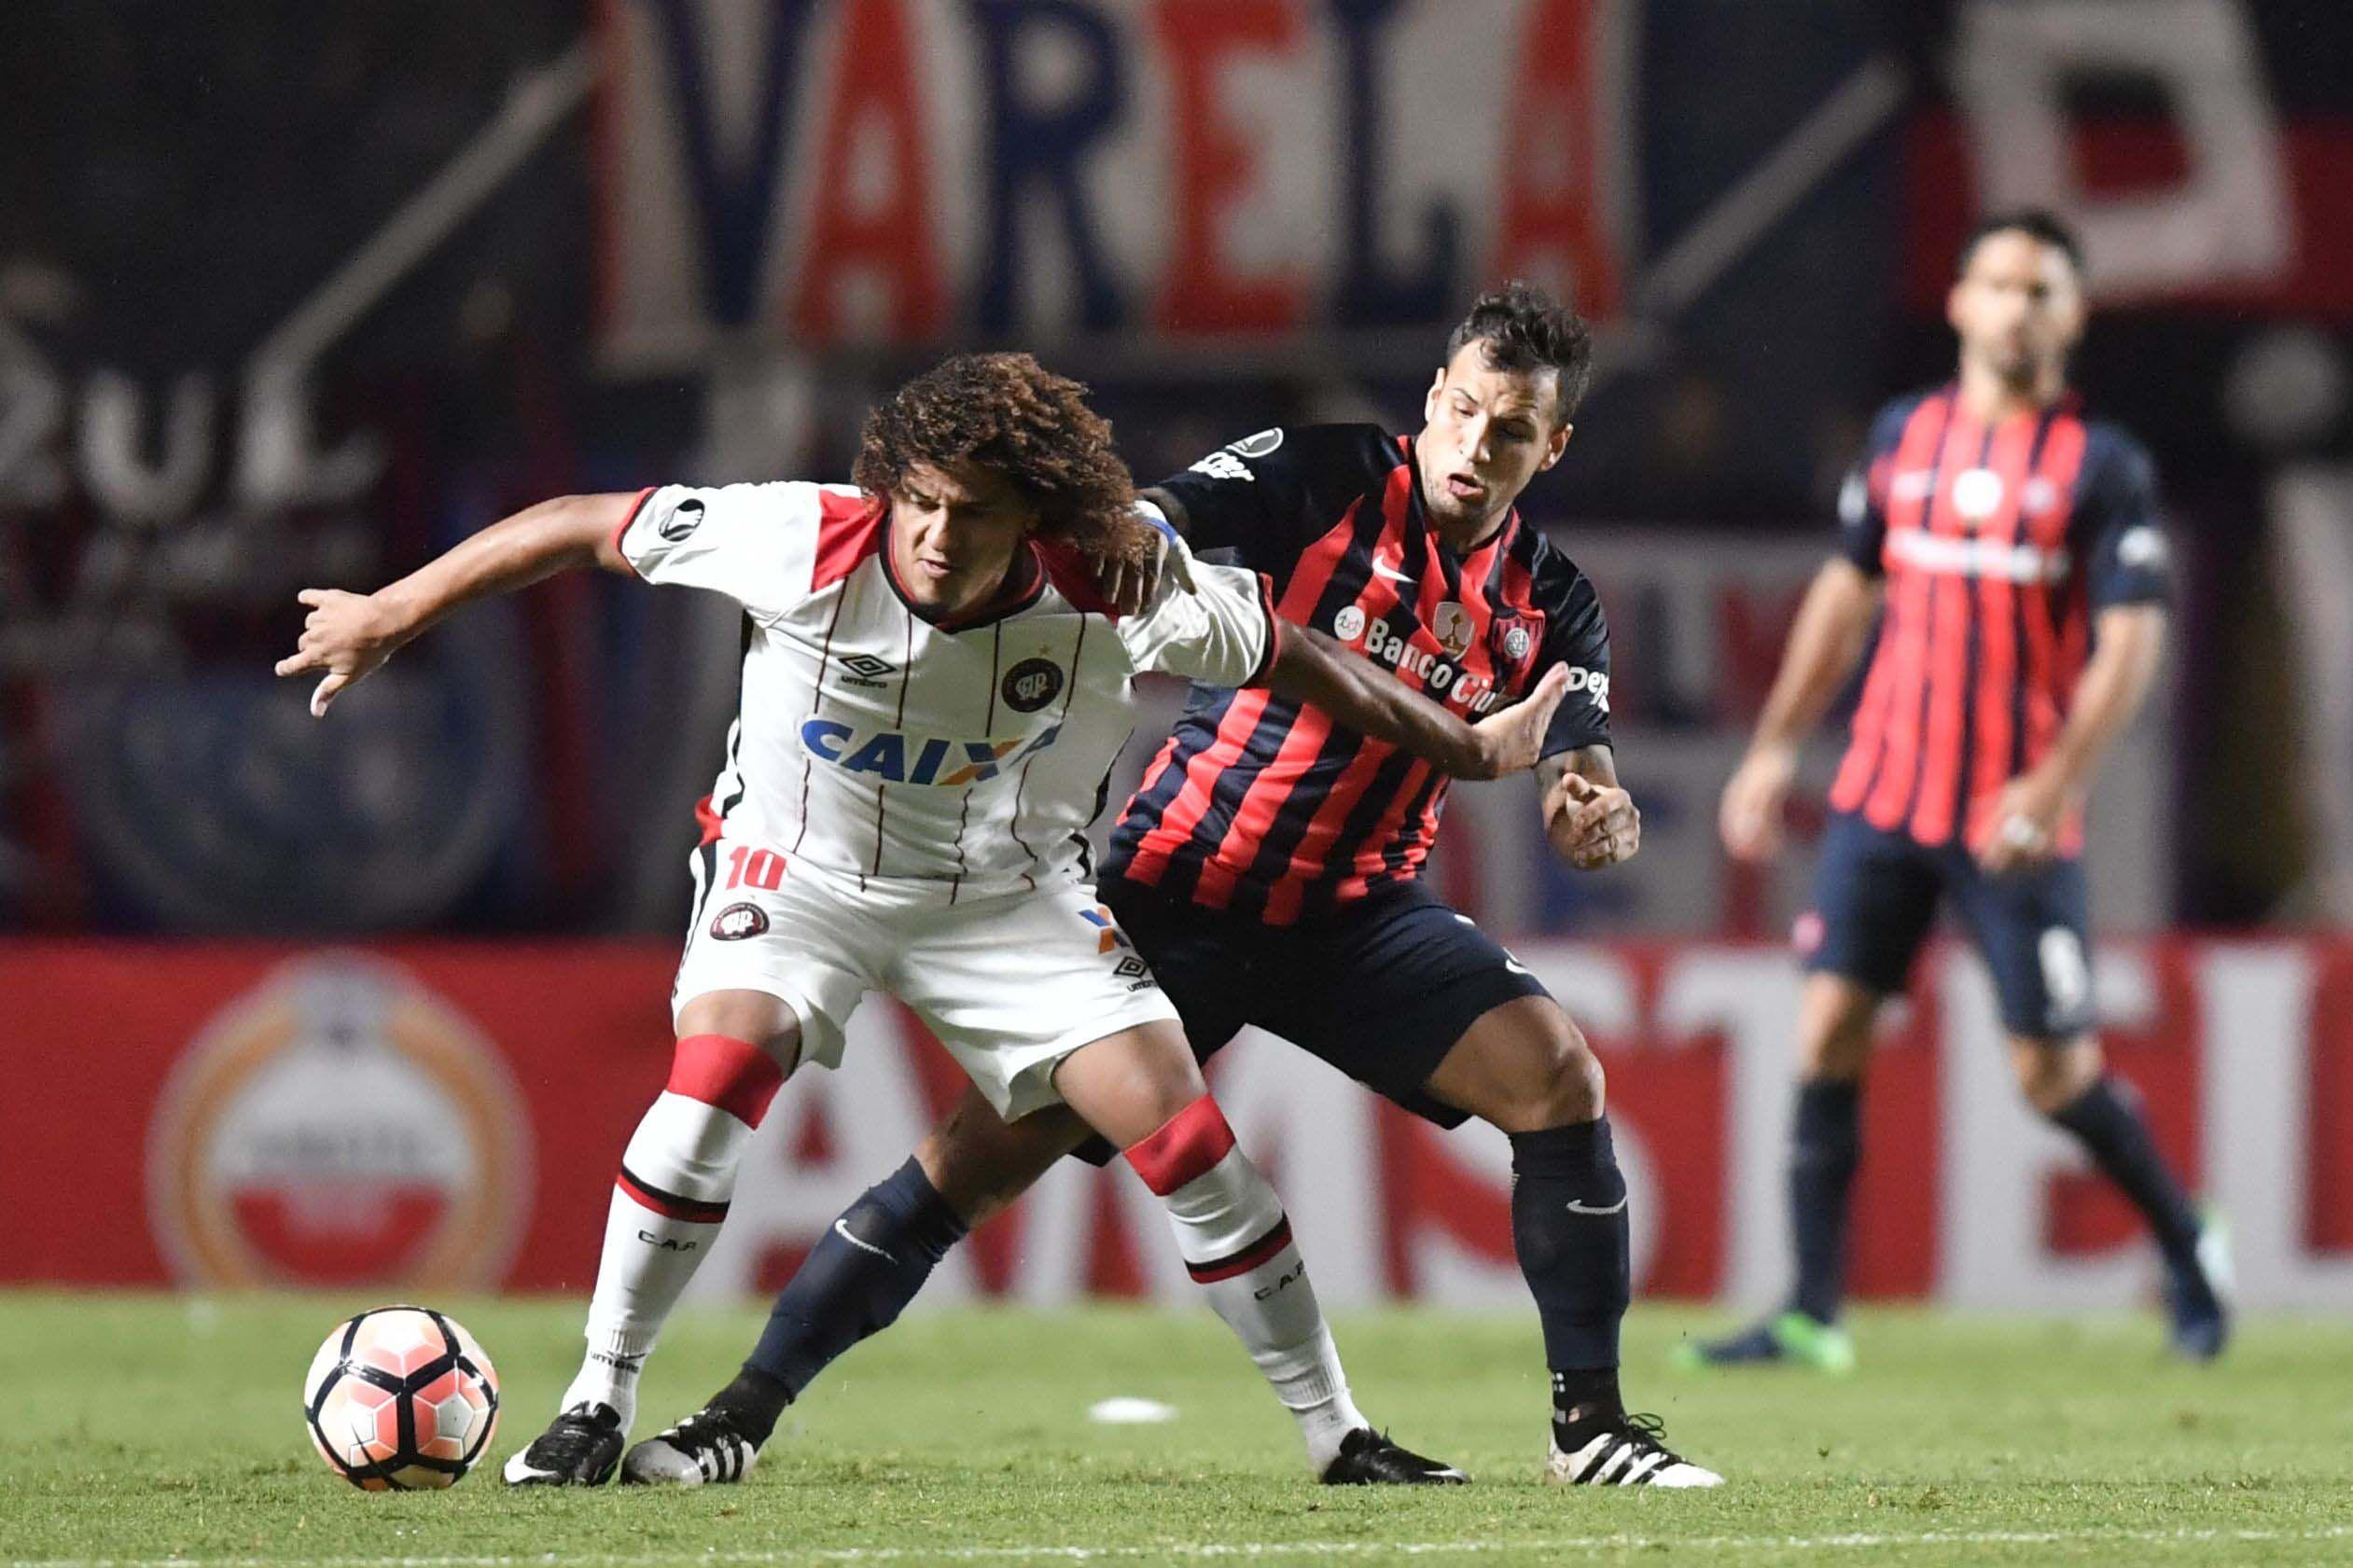 La lucha de Mussis para robar la pelota ante Atlético Paranaense